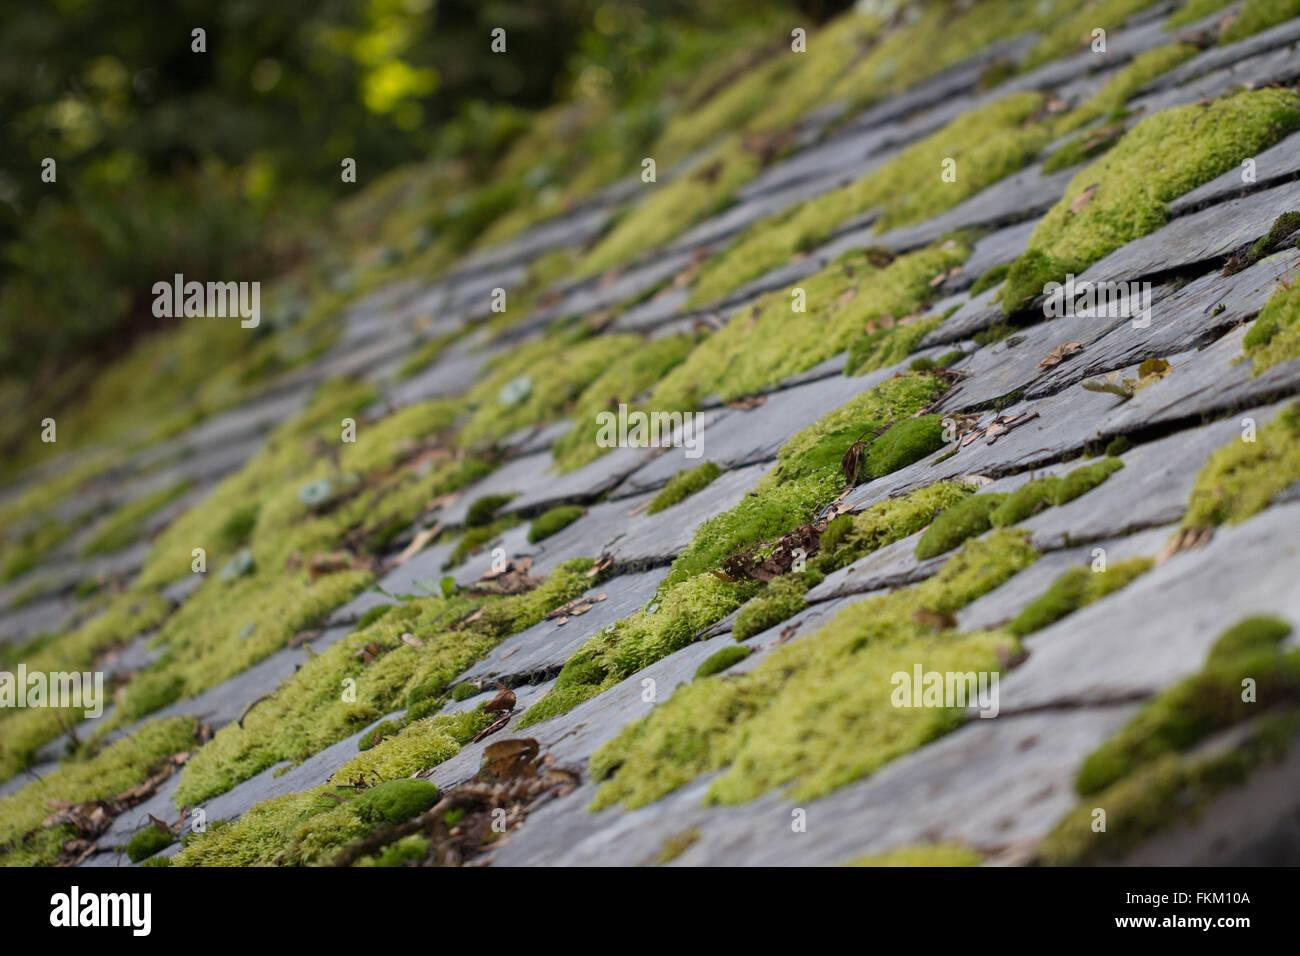 Green moss on slate roof tiles - Stock Image